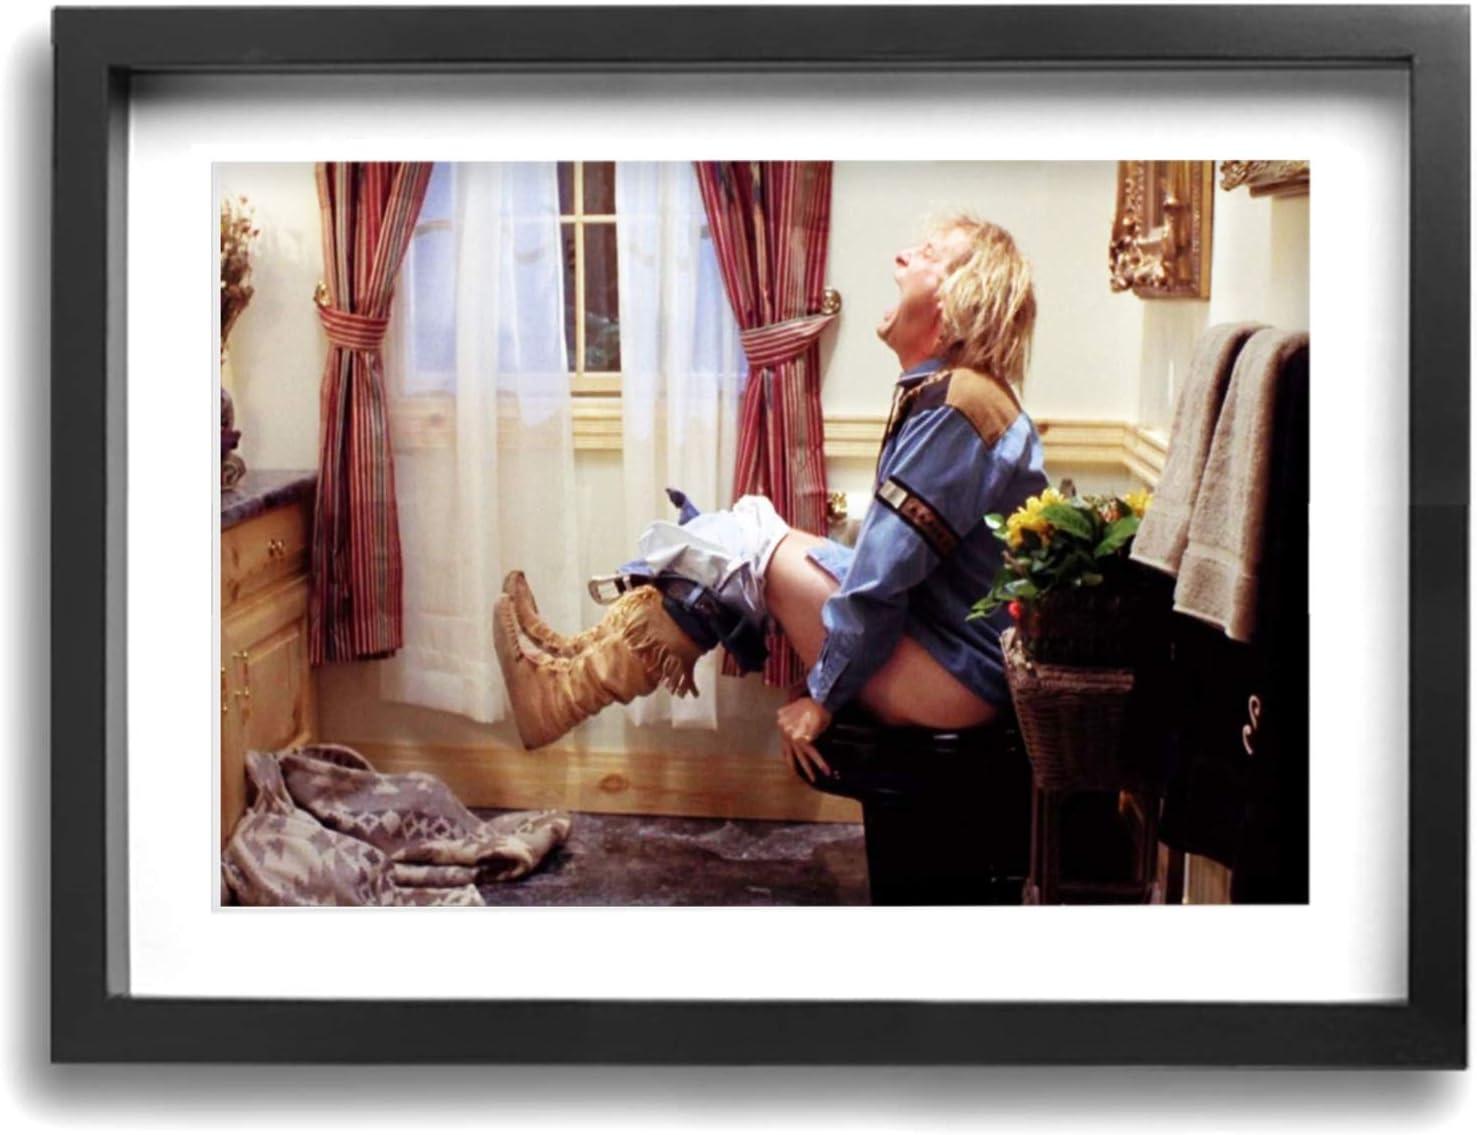 Antonia Bellamy Dumb Movie Wall Art The Toilet Poster Funny Dumber Bathroom Art Frame 12